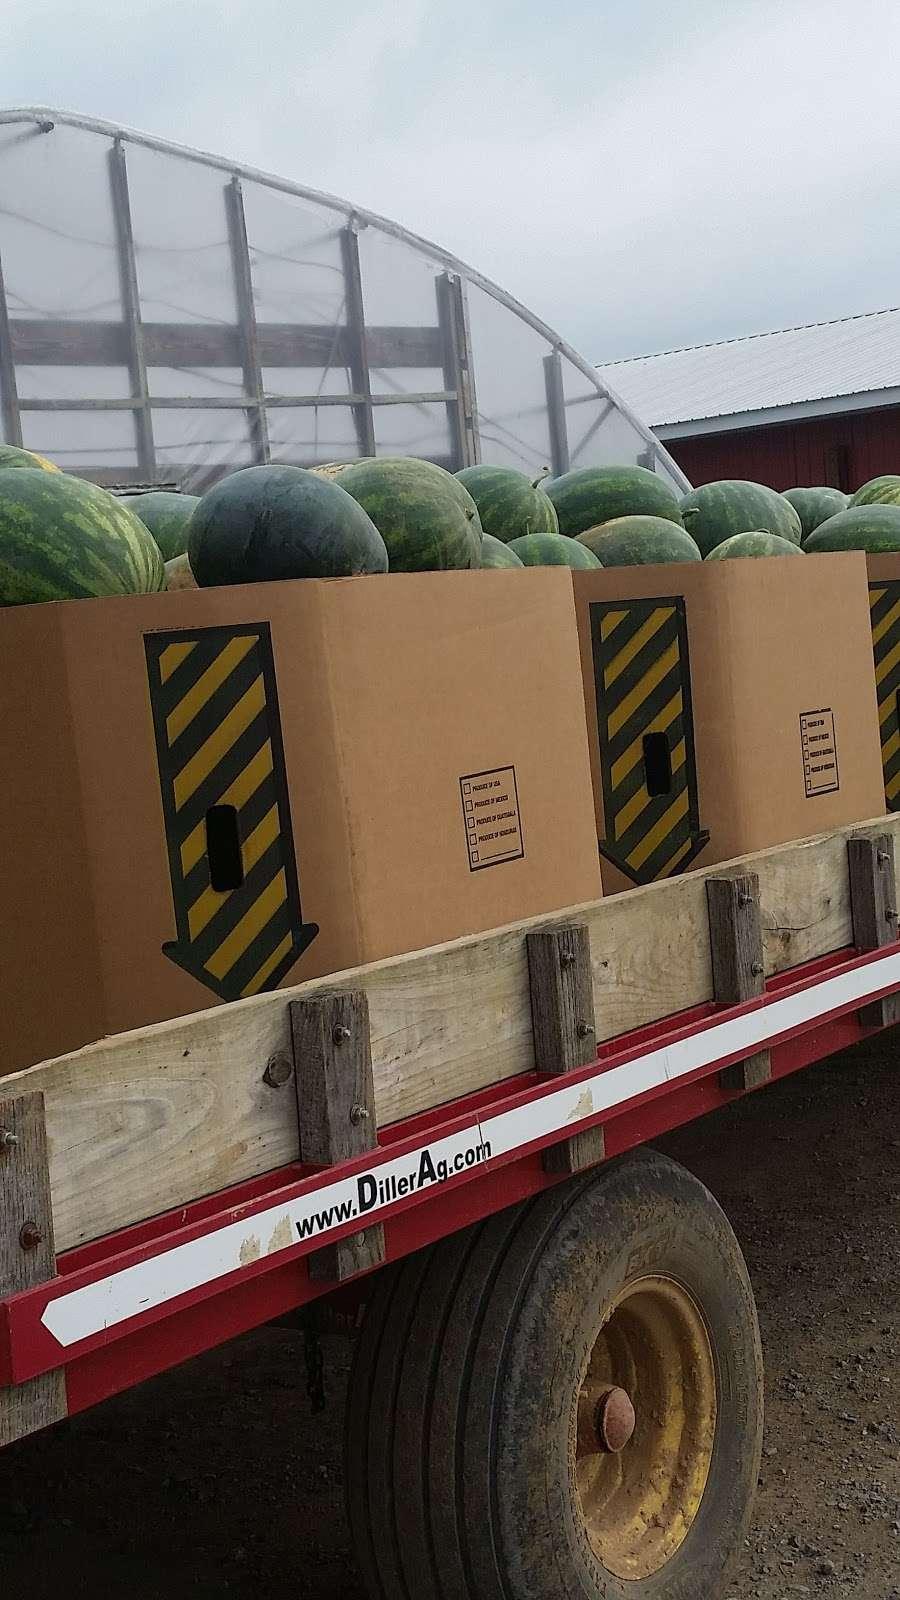 Housers Produce Farm Inc - store  | Photo 1 of 4 | Address: 16517 Shaffer Rd, Sharpsburg, MD 21782, USA | Phone: (301) 223-6399